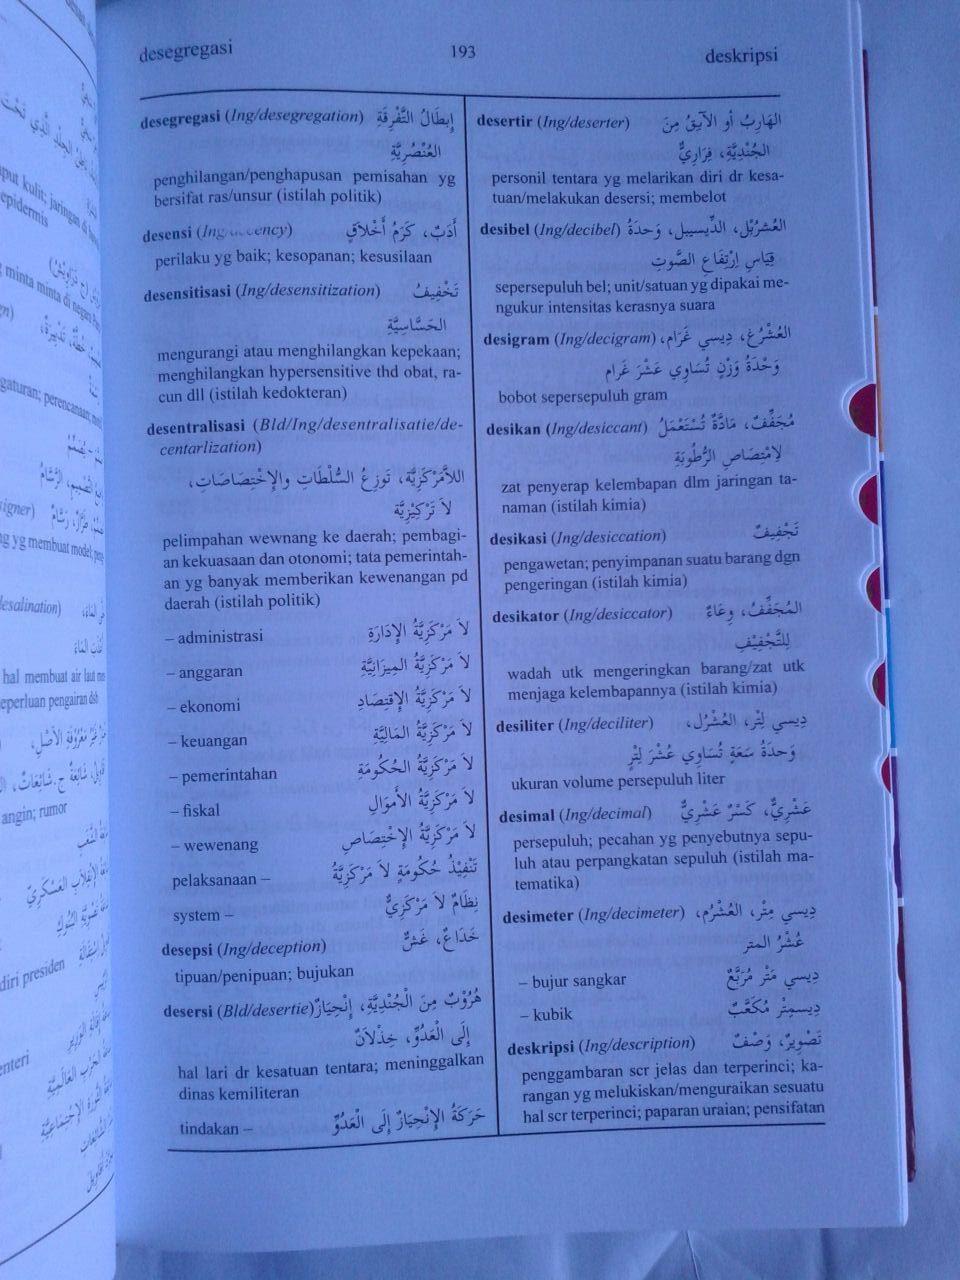 Buku Kamus Istilah Modern Al-Munawwir Indonesia-Arab isi